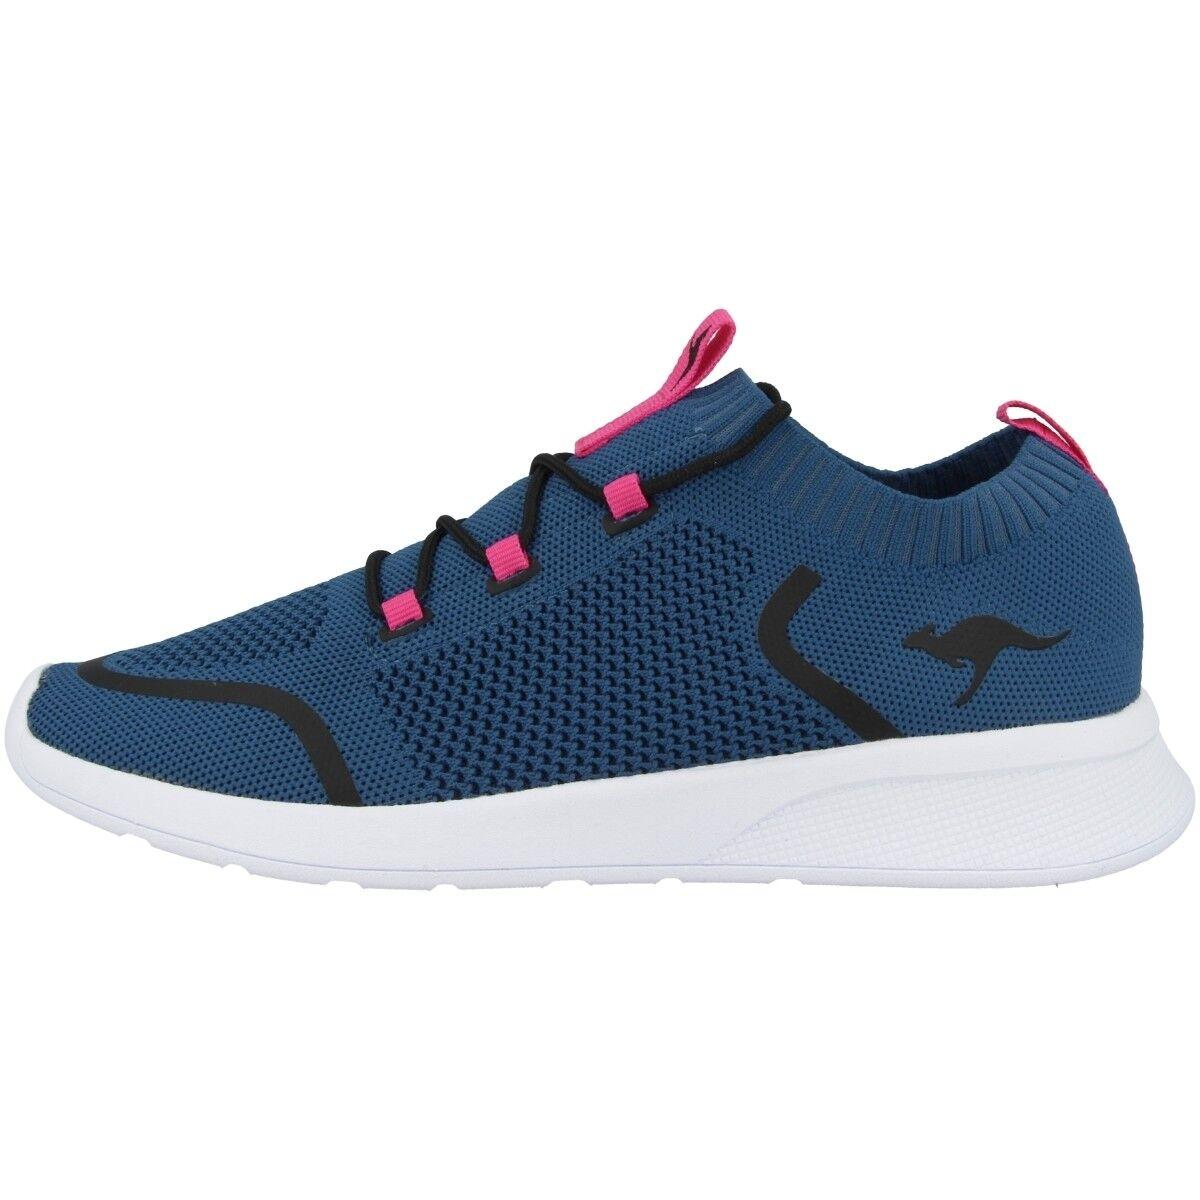 Kangaroos Kf Weave shoes Women's Casual Trainers Iced bluee 18317-4219